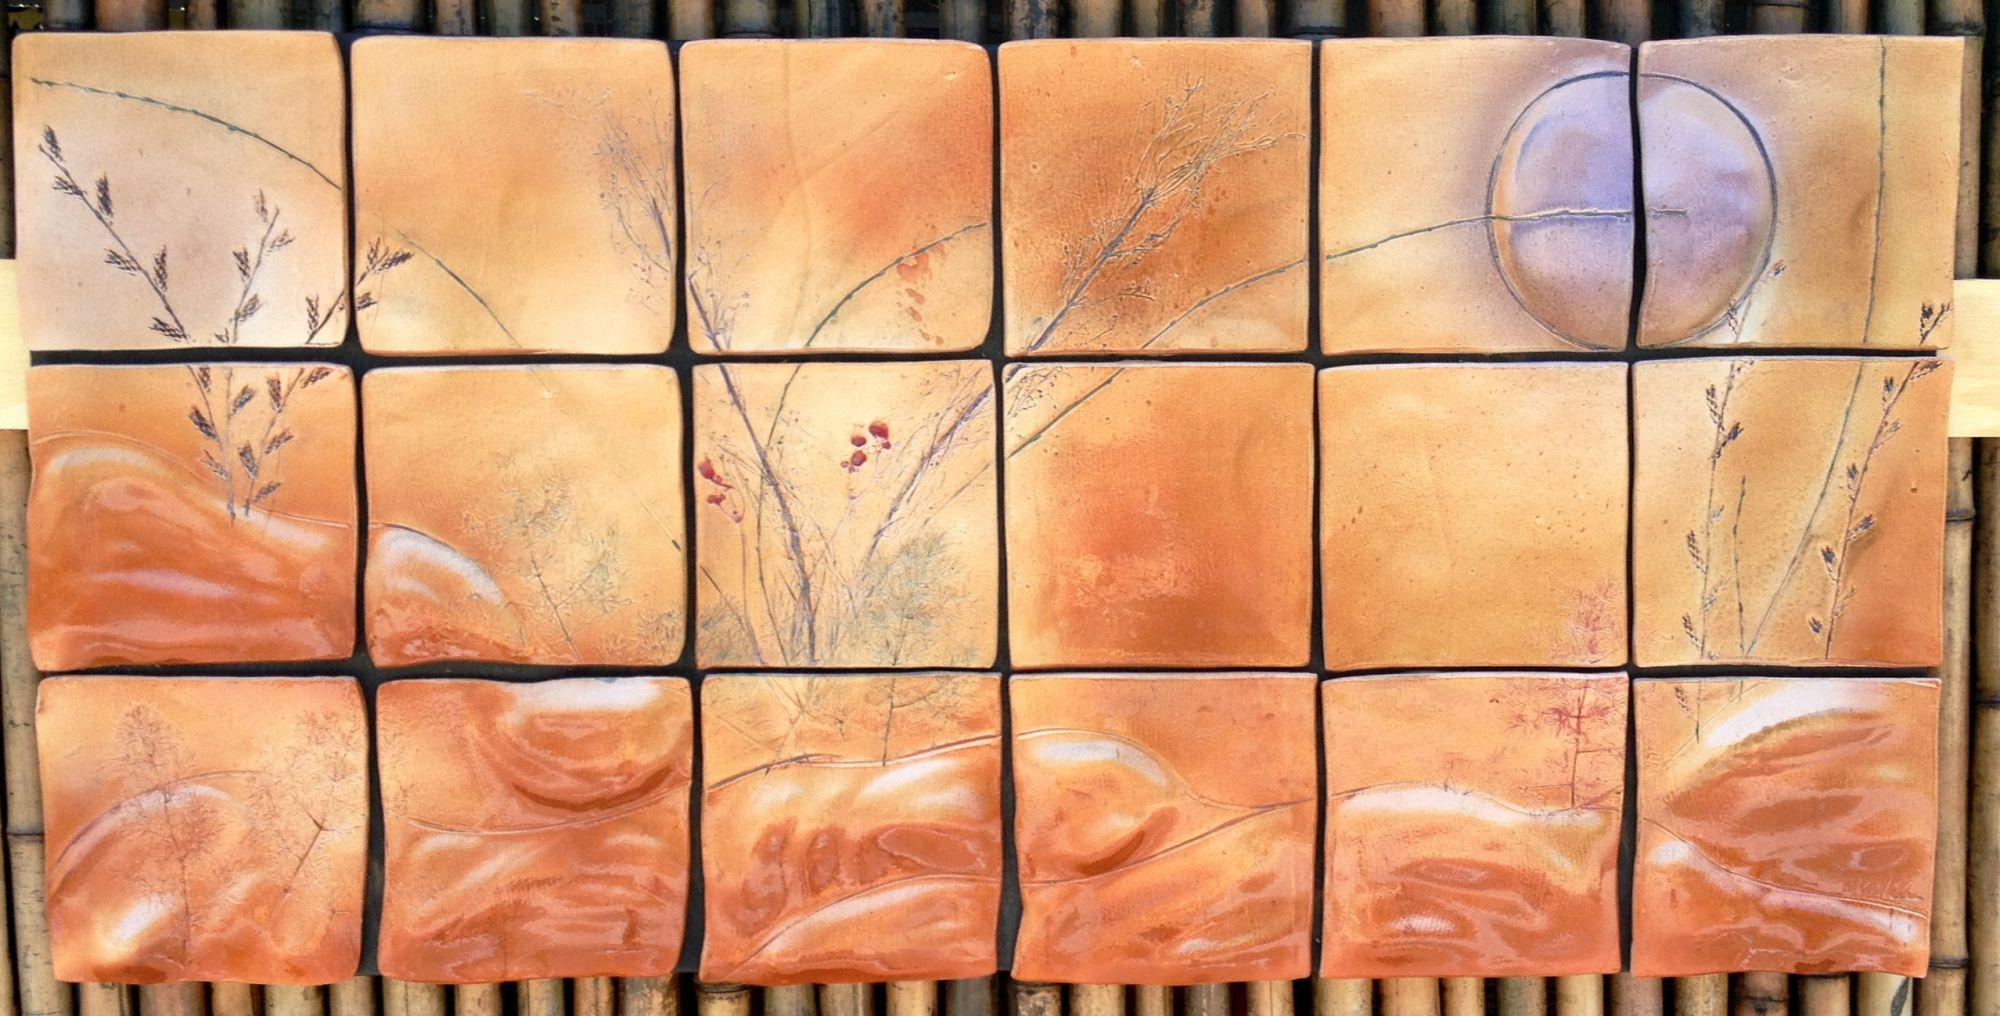 amethyst moonrise ceramic tile wall art